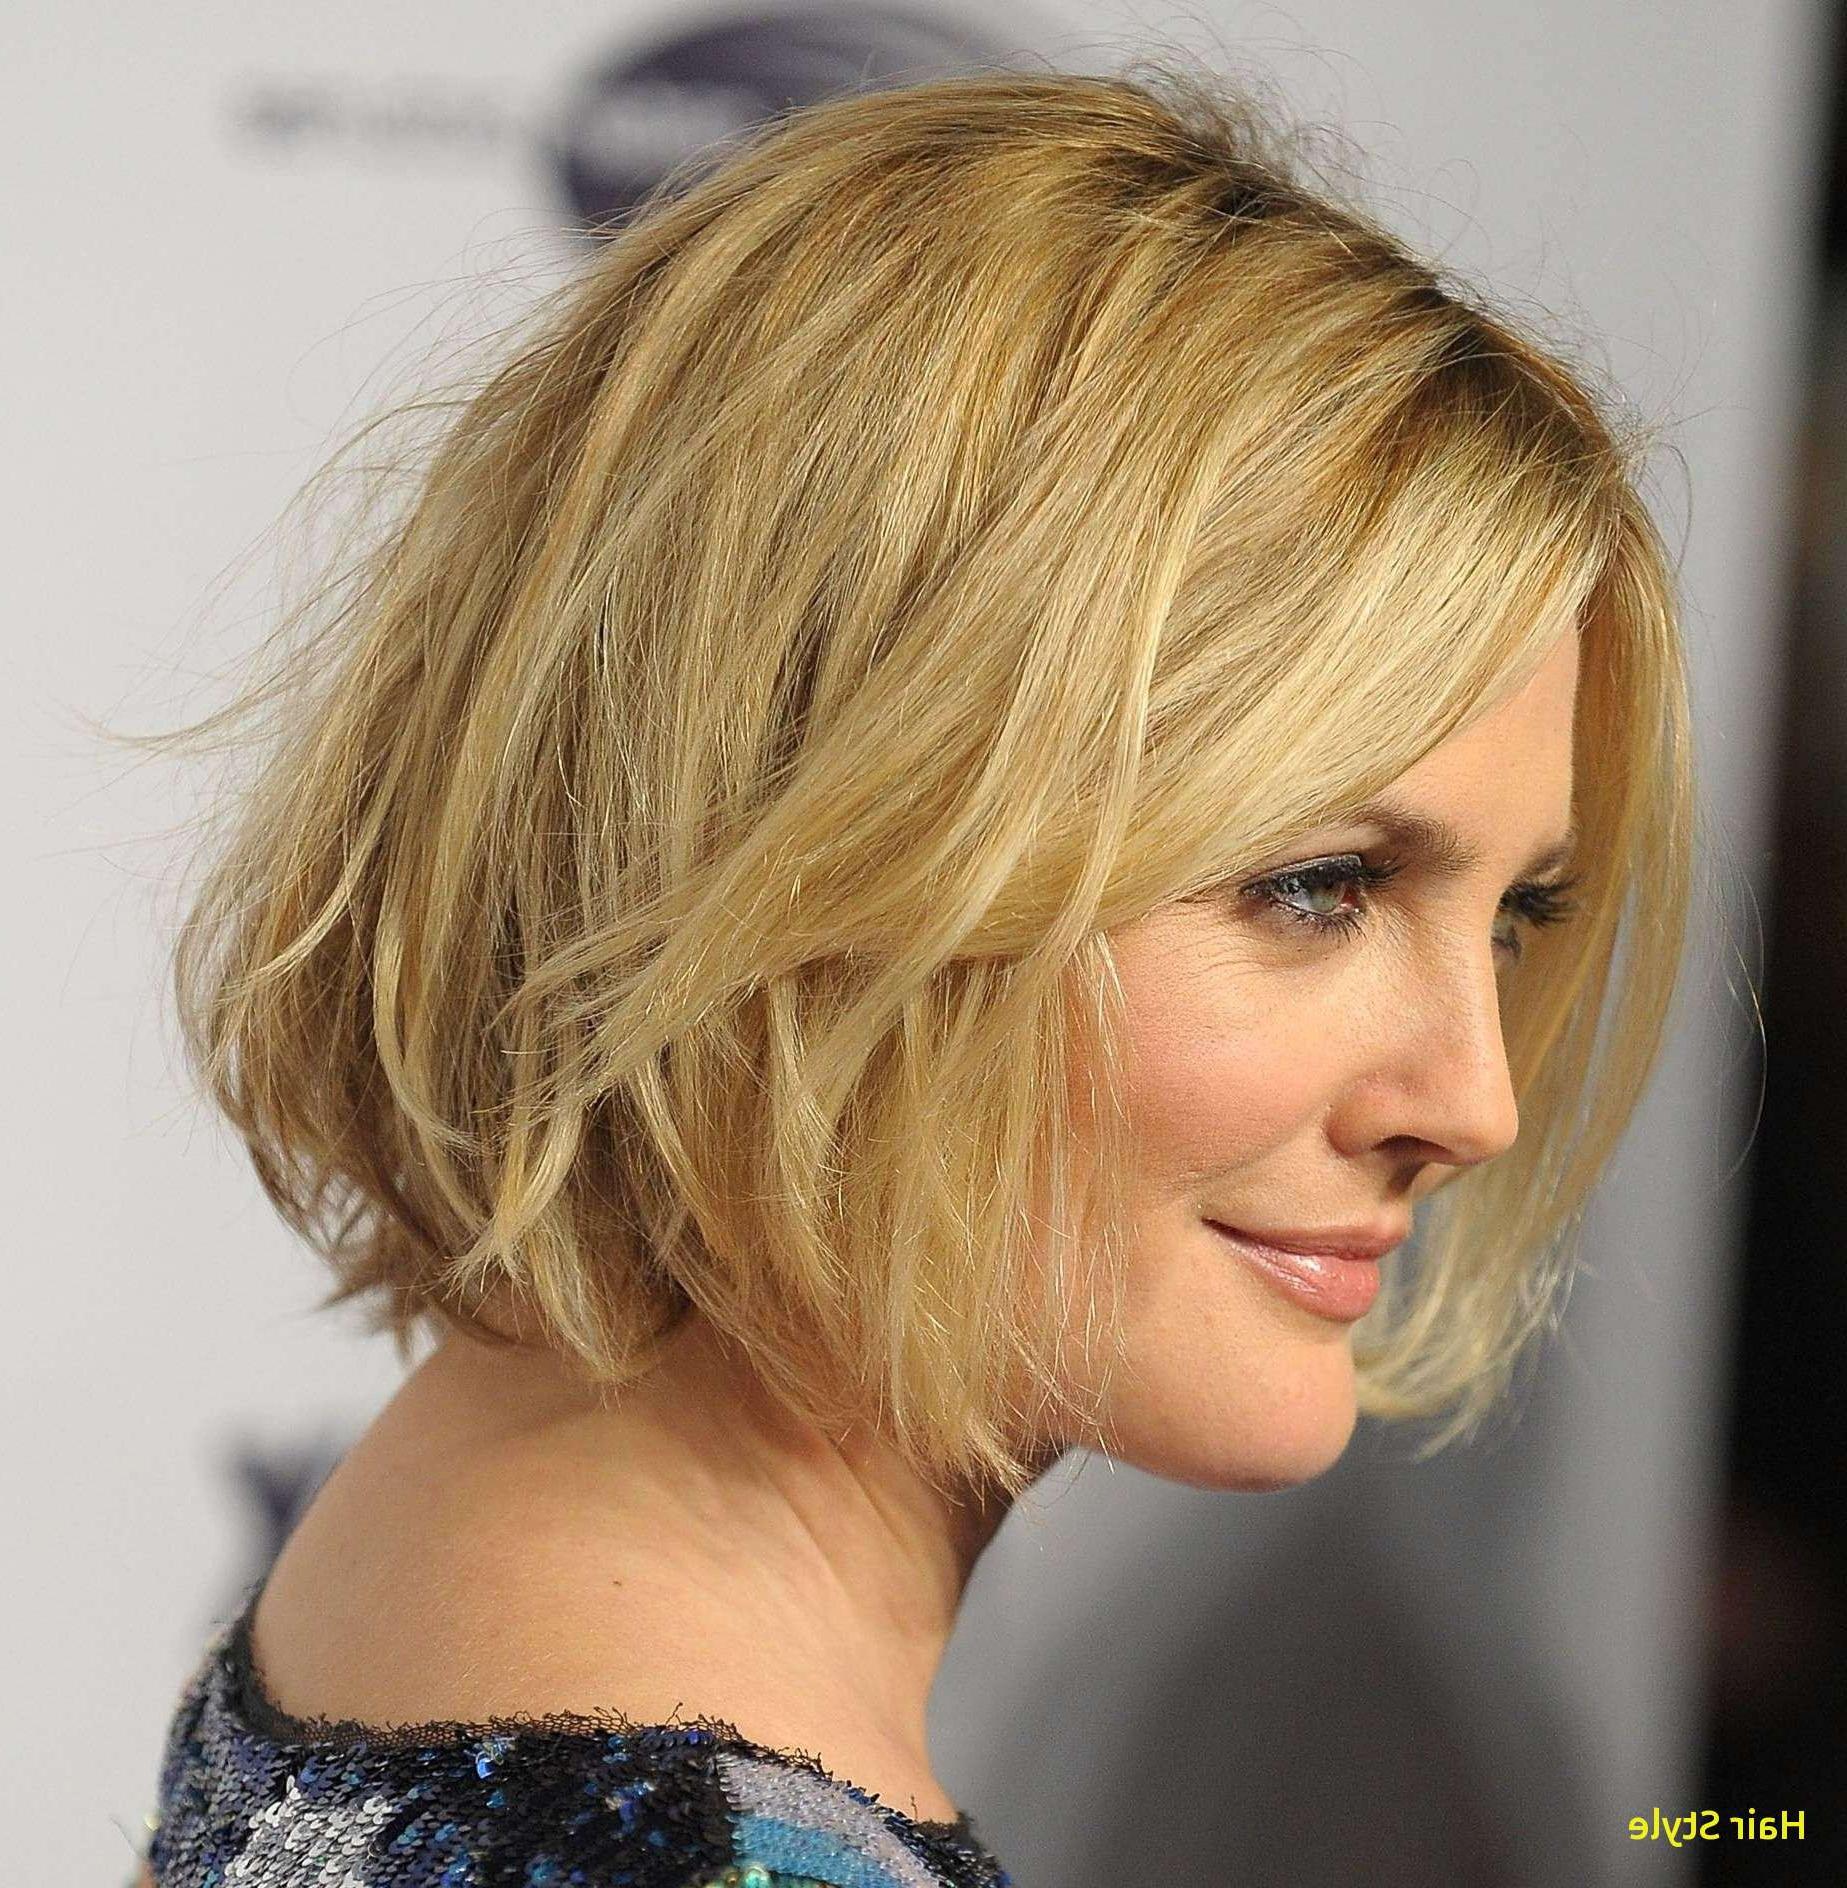 Drew Barrymore Short Hairstyles New Fresh Short Bob Hairstyles 2016 with Drew Barrymore Short Haircuts